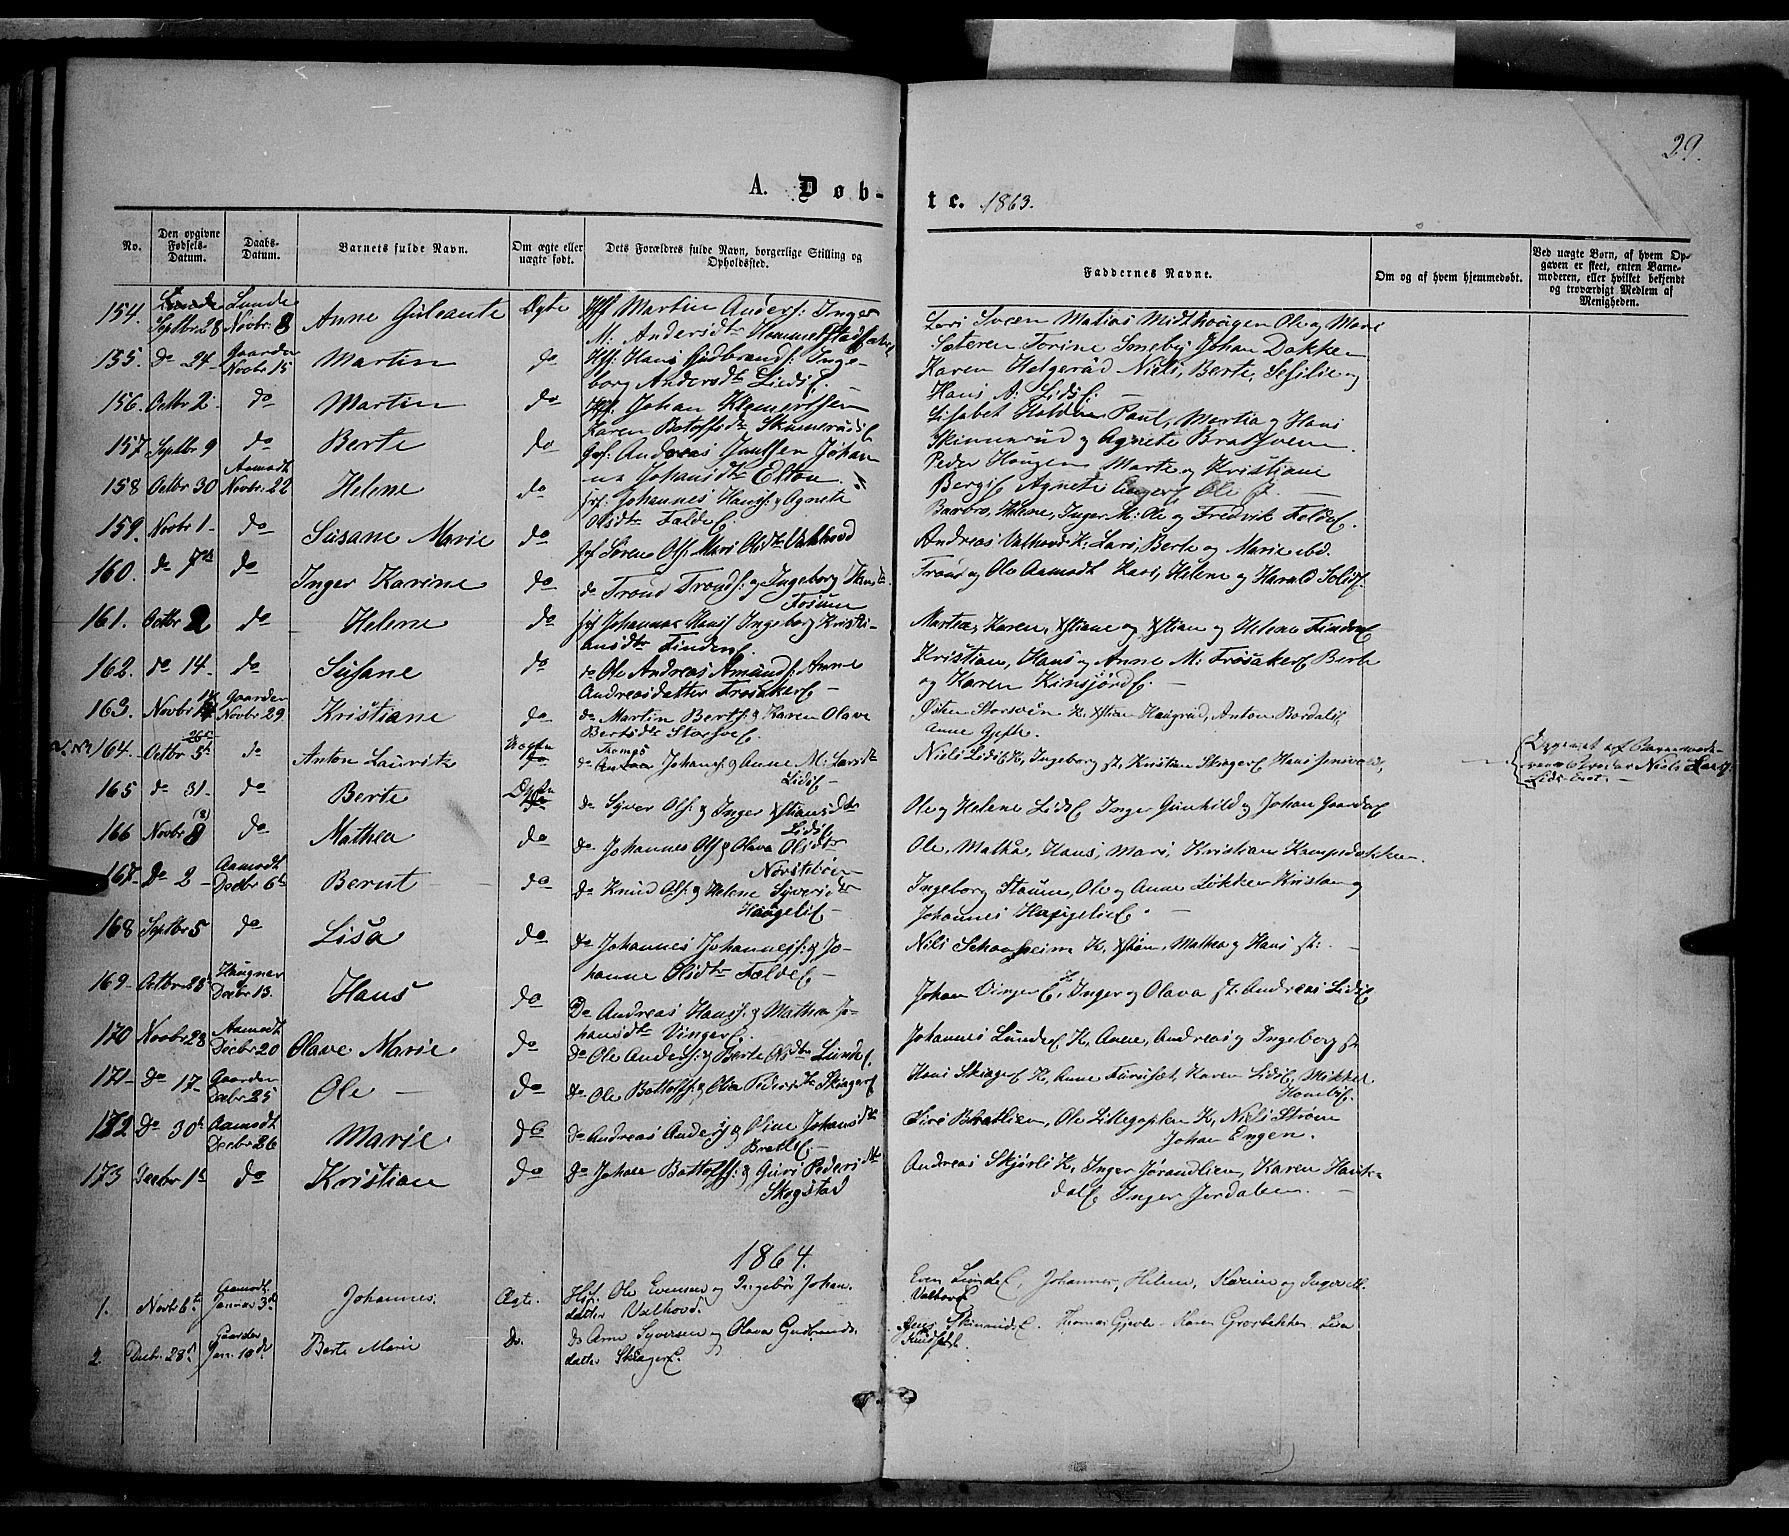 SAH, Nordre Land prestekontor, Ministerialbok nr. 1, 1860-1871, s. 29